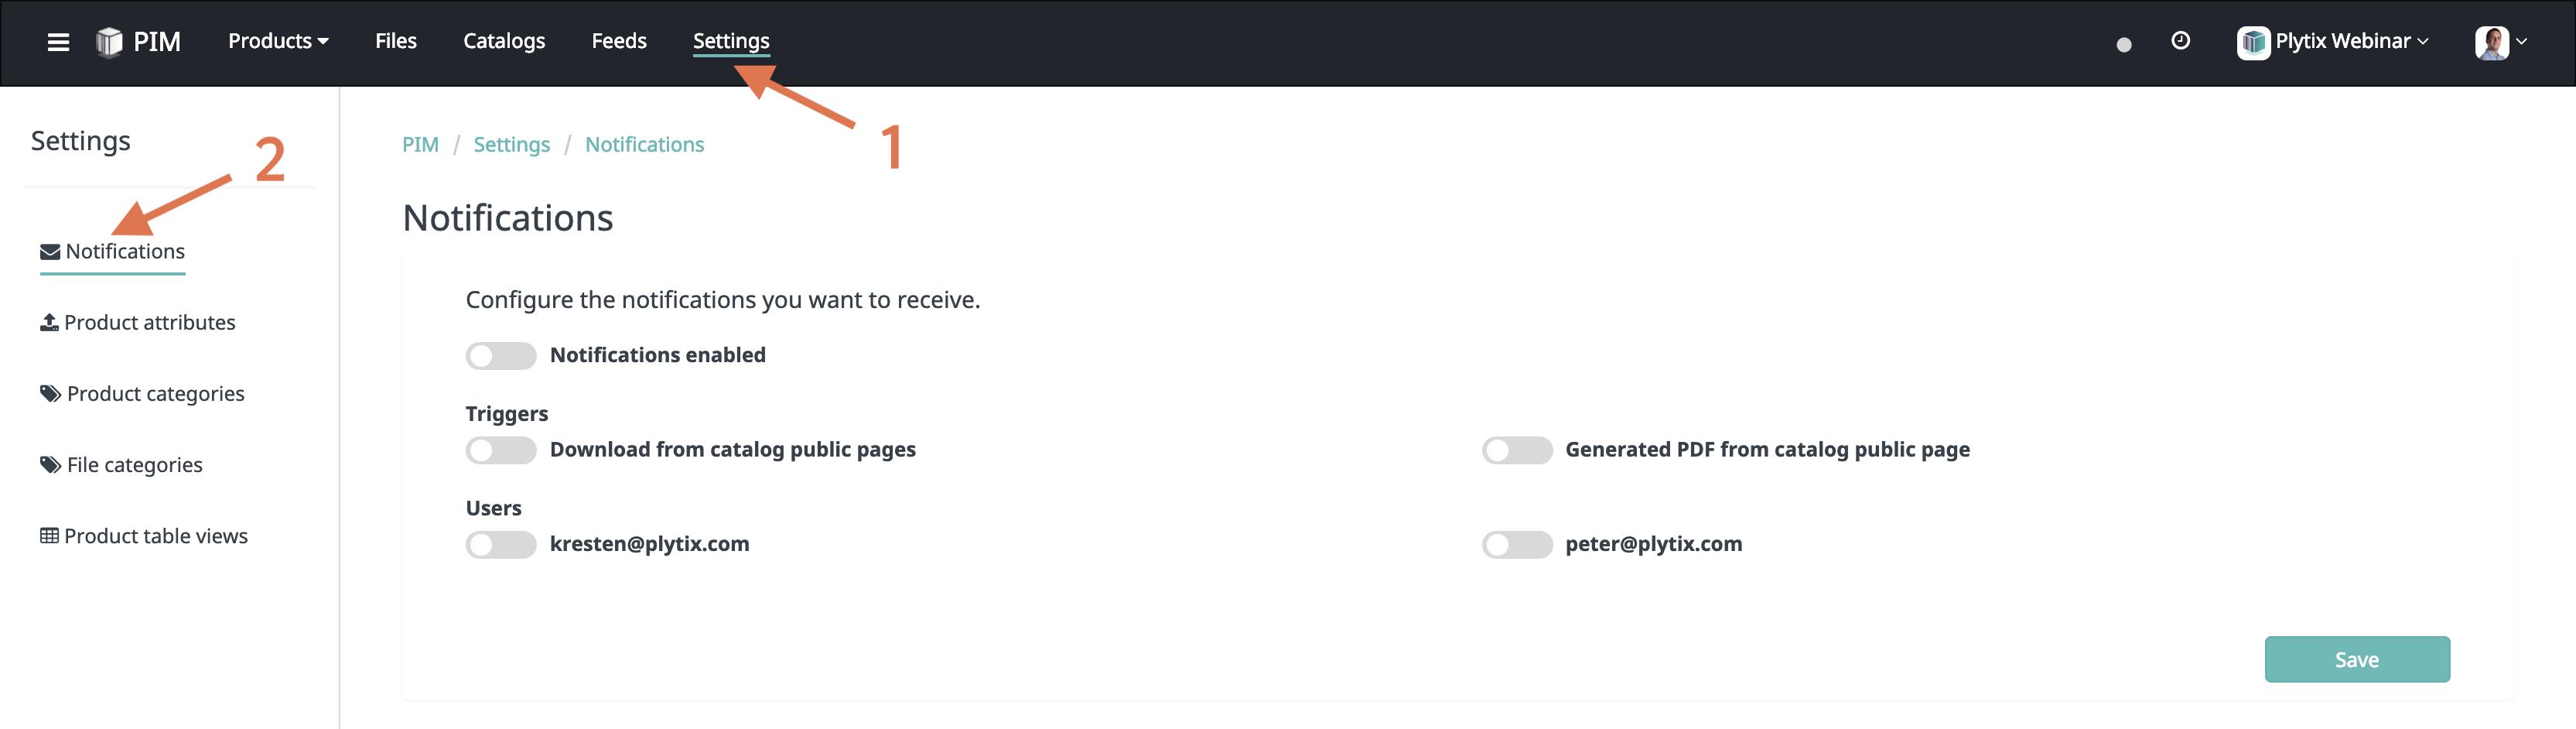 Managing notification settings